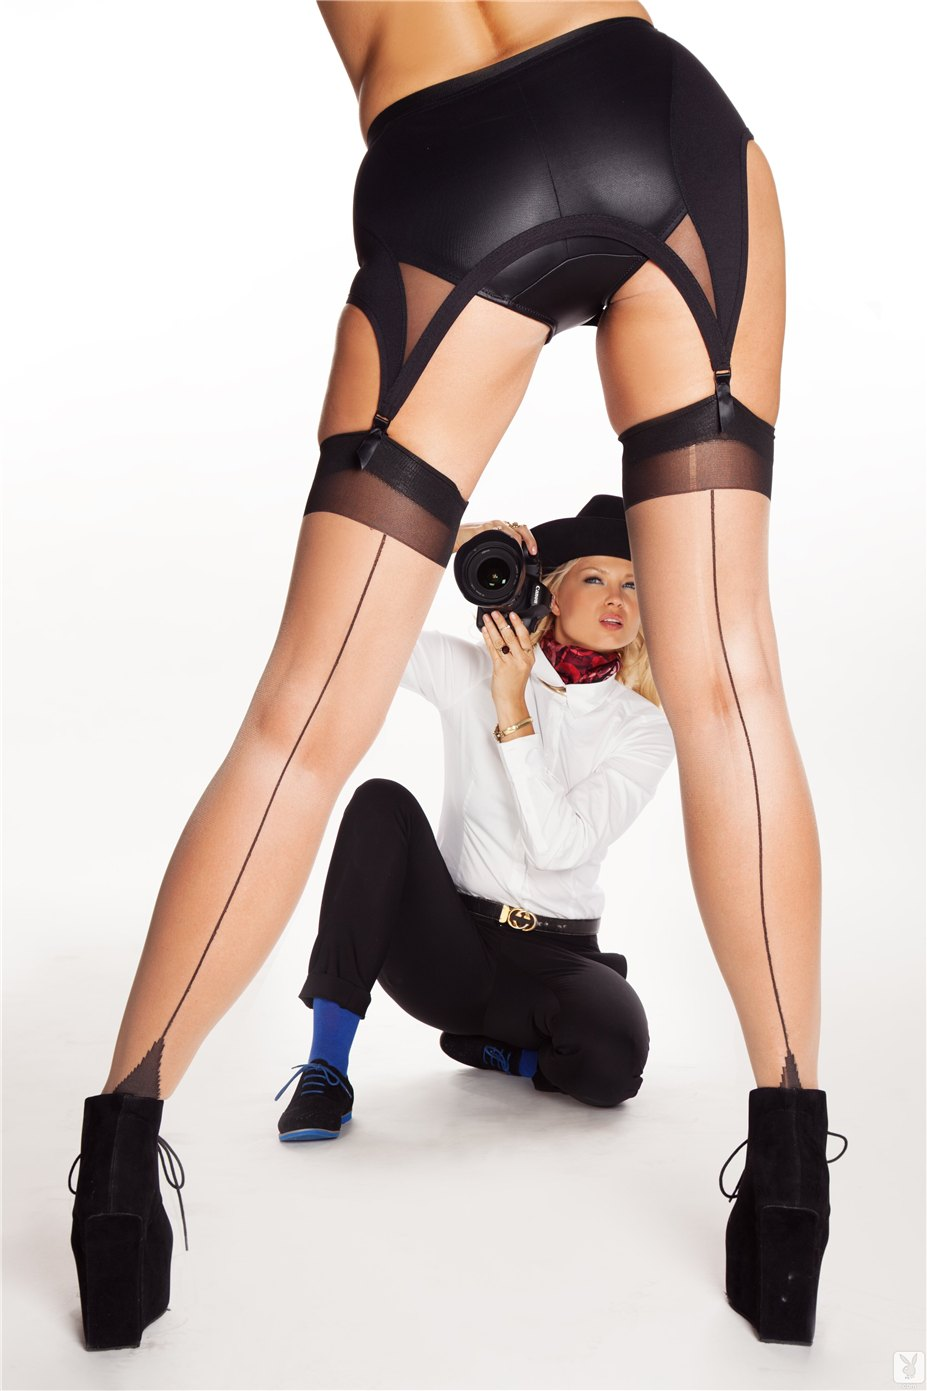 Ирина Воронина / Irina Voronina - Playboy online / Killer Shots